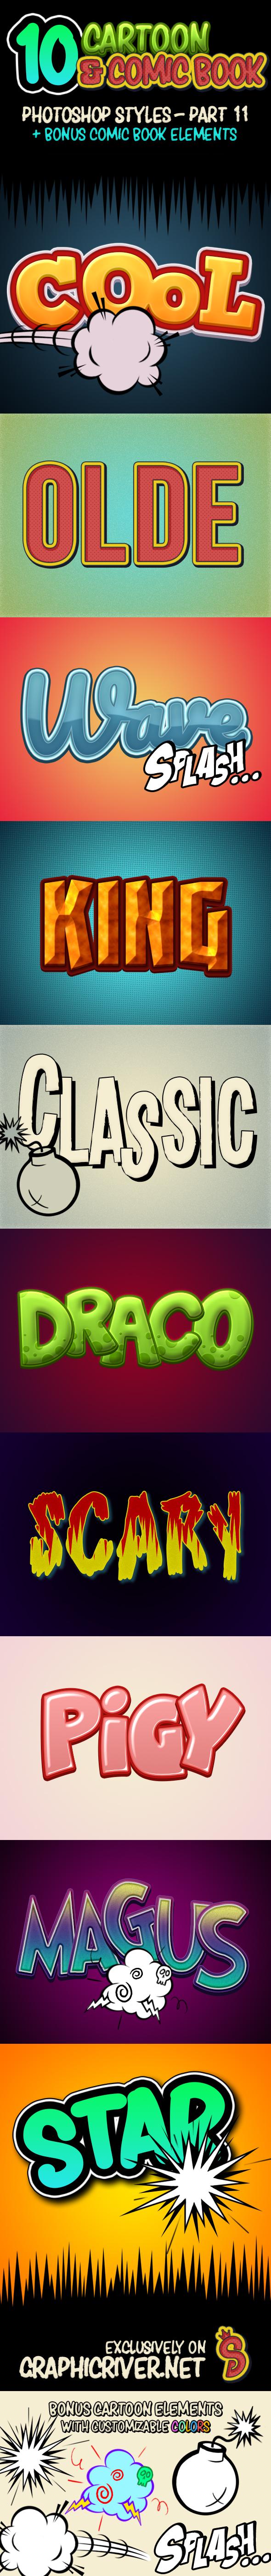 Cartoon and Comic Book Photoshop Styles - PART 11 by survivorcz